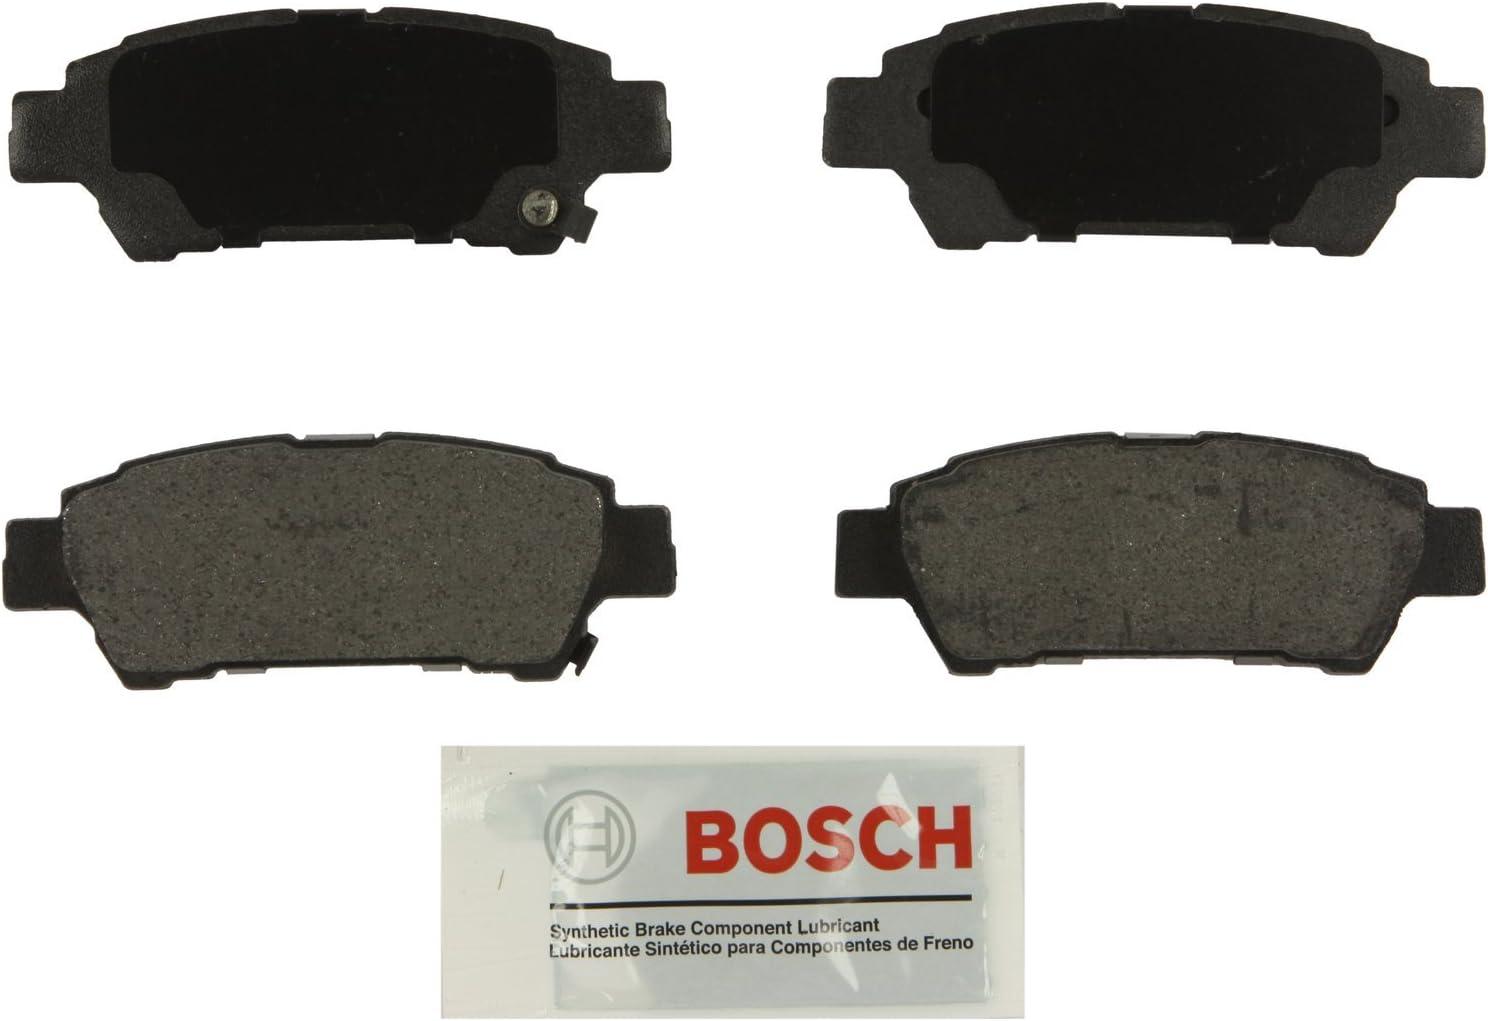 Bosch BC995 QuietCast Premium Ceramic Disc Brake Pad Set For 2004-2010 Toyota Sienna; Rear